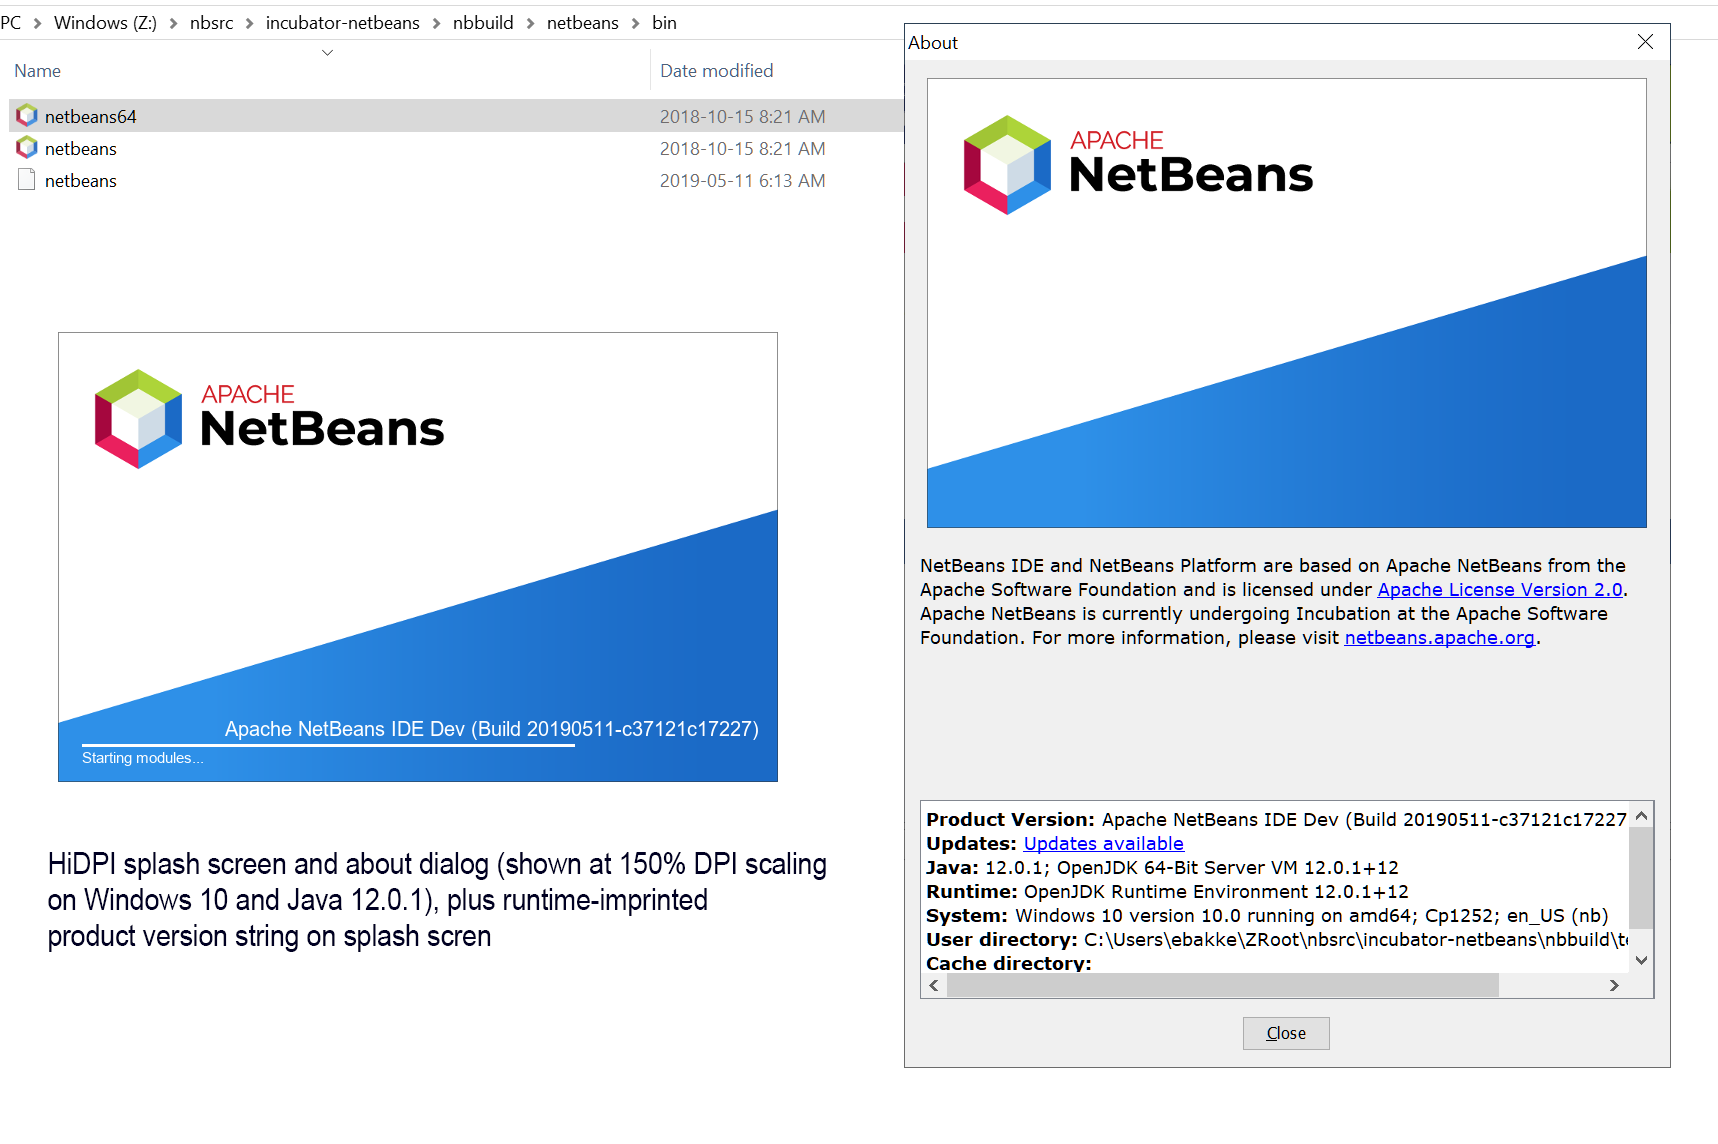 Splash Screen HiDPI and Product Version